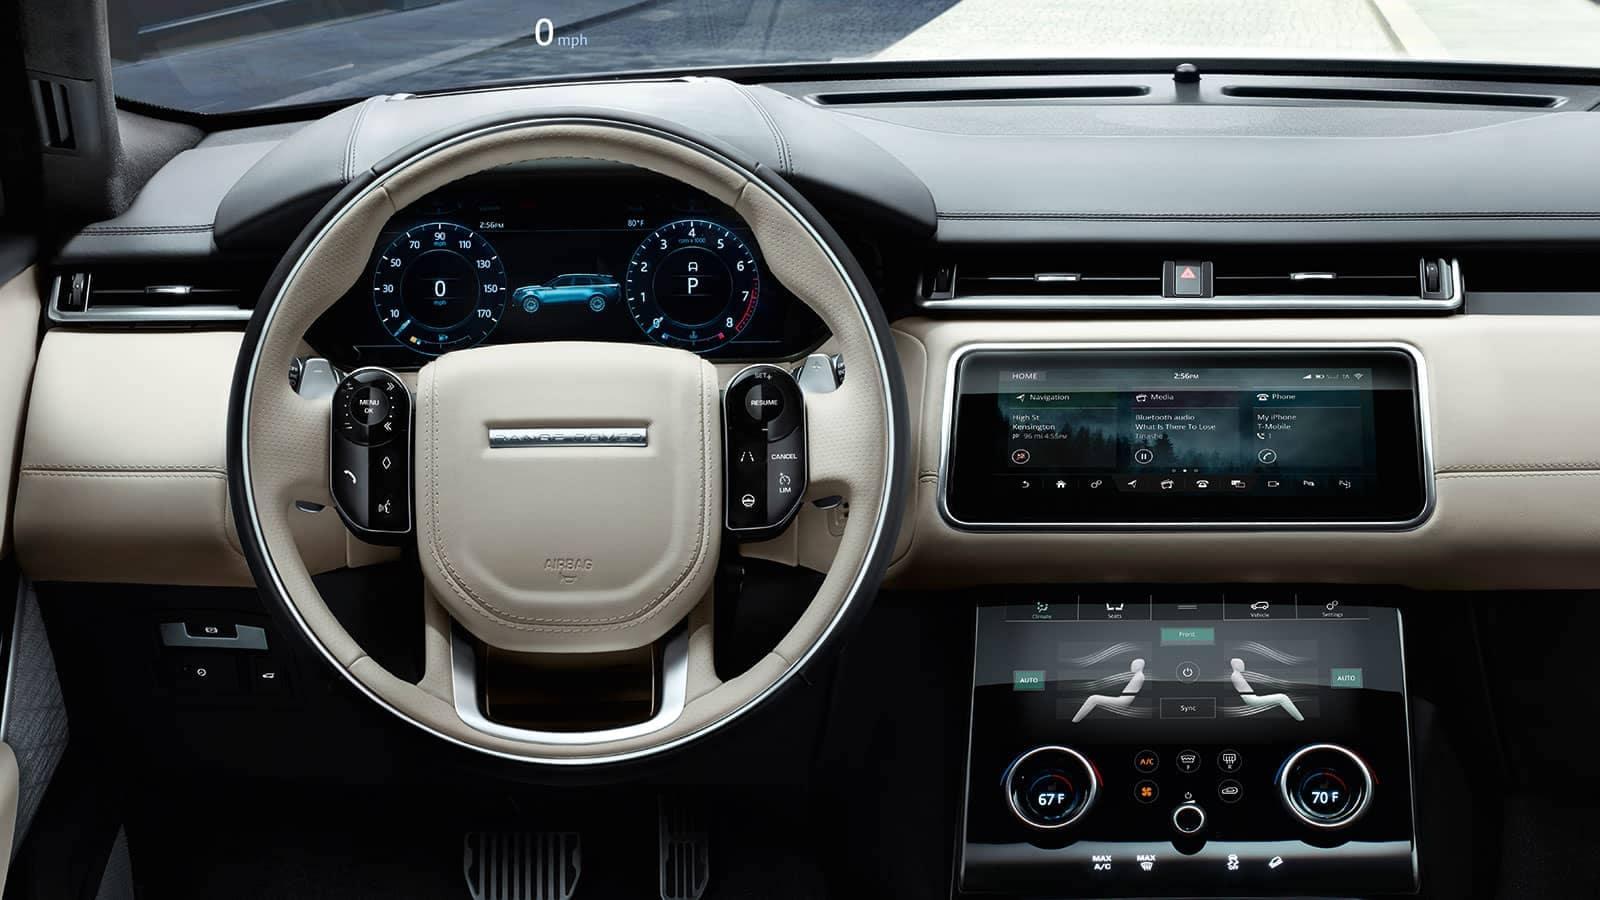 2019 Land Rover Range Rover Velar driver view